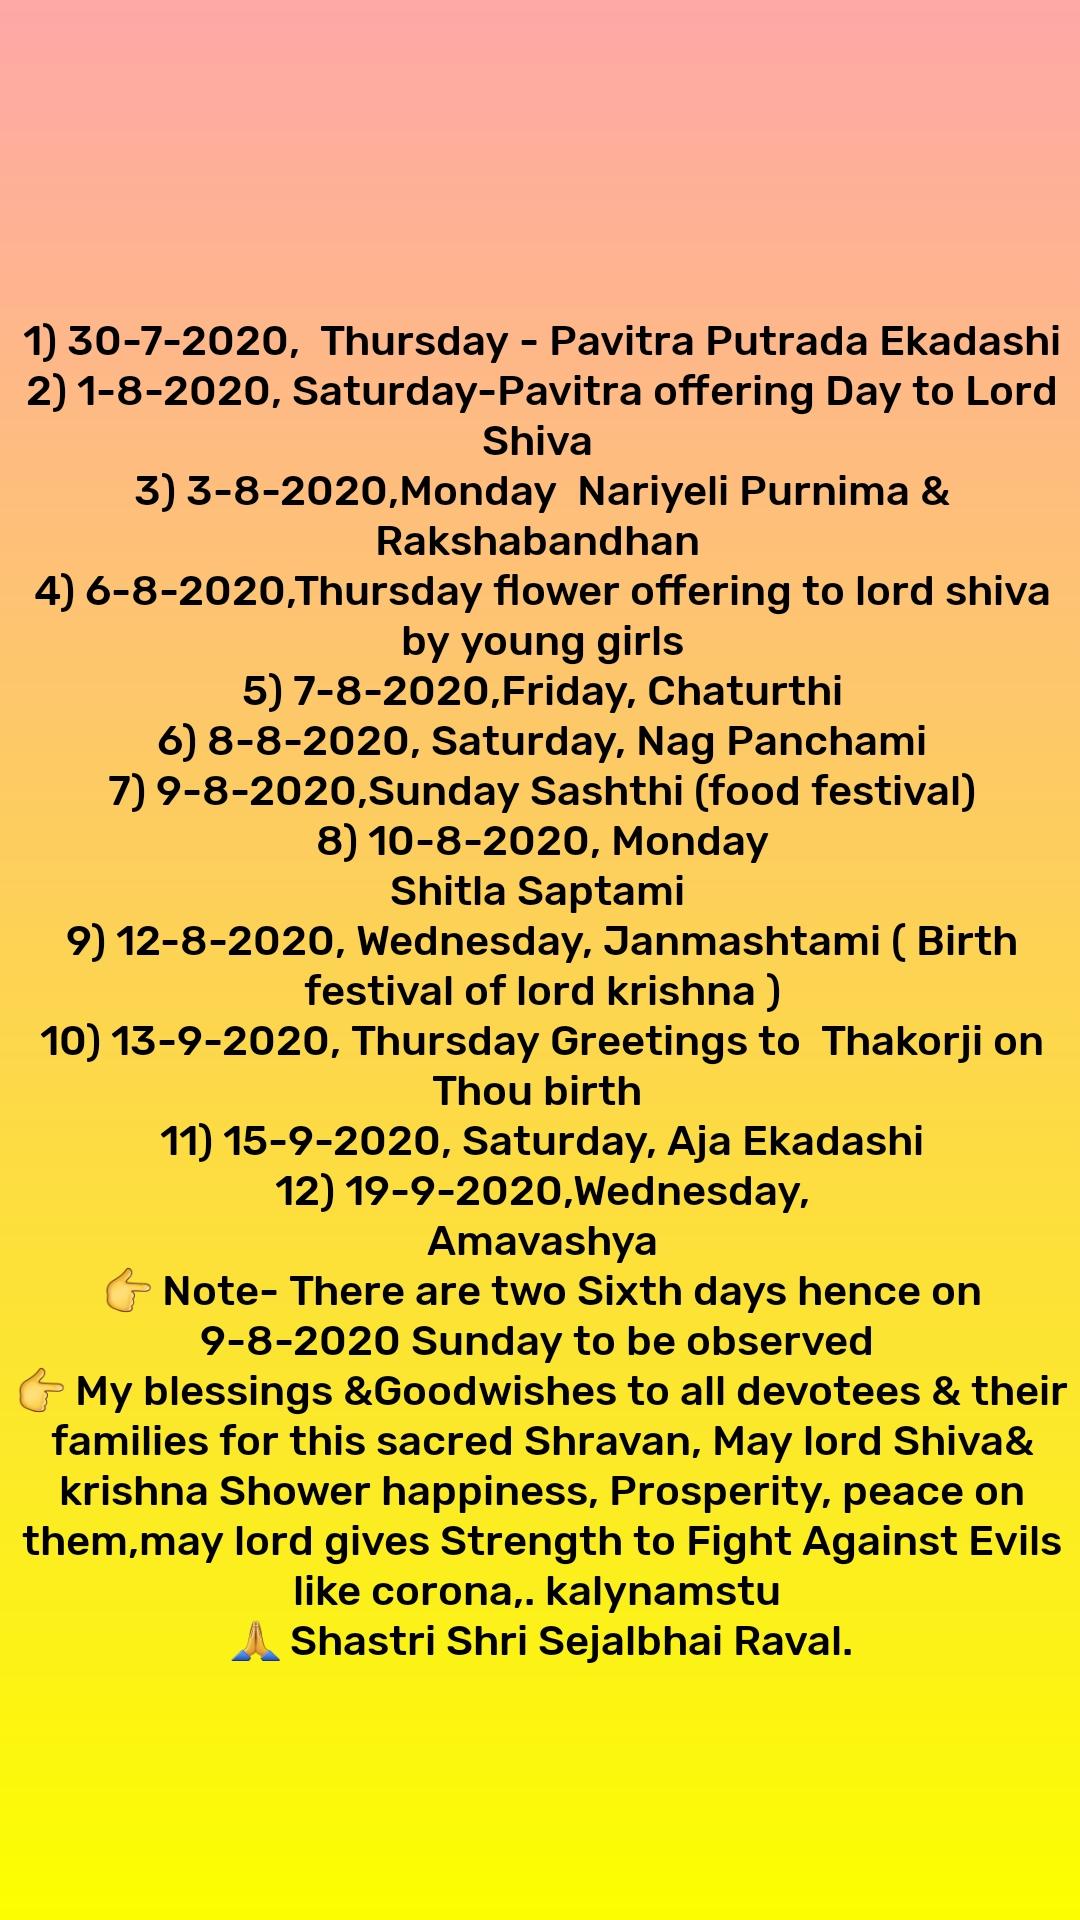 1) 30-7-2020,  Thursday - Pavitra Putrada Ekadashi 2) 1-8-2020, Saturday-Pavitra offering Day to Lord Shiva  3) 3-8-2020,Monday  Nariyeli Purnima & Rakshabandhan  4) 6-8-2020,Thursday flower offering to lord shiva by young girls 5) 7-8-2020,Friday, Chaturthi 6) 8-8-2020, Saturday, Nag Panchami 7) 9-8-2020,Sunday Sashthi (food festival) 8) 10-8-2020, Monday Shitla Saptami  9) 12-8-2020, Wednesday, Janmashtami ( Birth festival of lord krishna ) 10) 13-9-2020, Thursday Greetings to  Thakorji on Thou birth  11) 15-9-2020, Saturday, Aja Ekadashi 12) 19-9-2020,Wednesday, Amavashya 👉 Note- There are two Sixth days hence on 9-8-2020 Sunday to be observed  👉 My blessings &Goodwishes to all devotees & their families for this sacred Shravan, May lord Shiva& krishna Shower happiness, Prosperity, peace on them,may lord gives Strength to Fight Against Evils like corona,. kalynamstu  🙏 Shastri Shri Sejalbhai Raval.